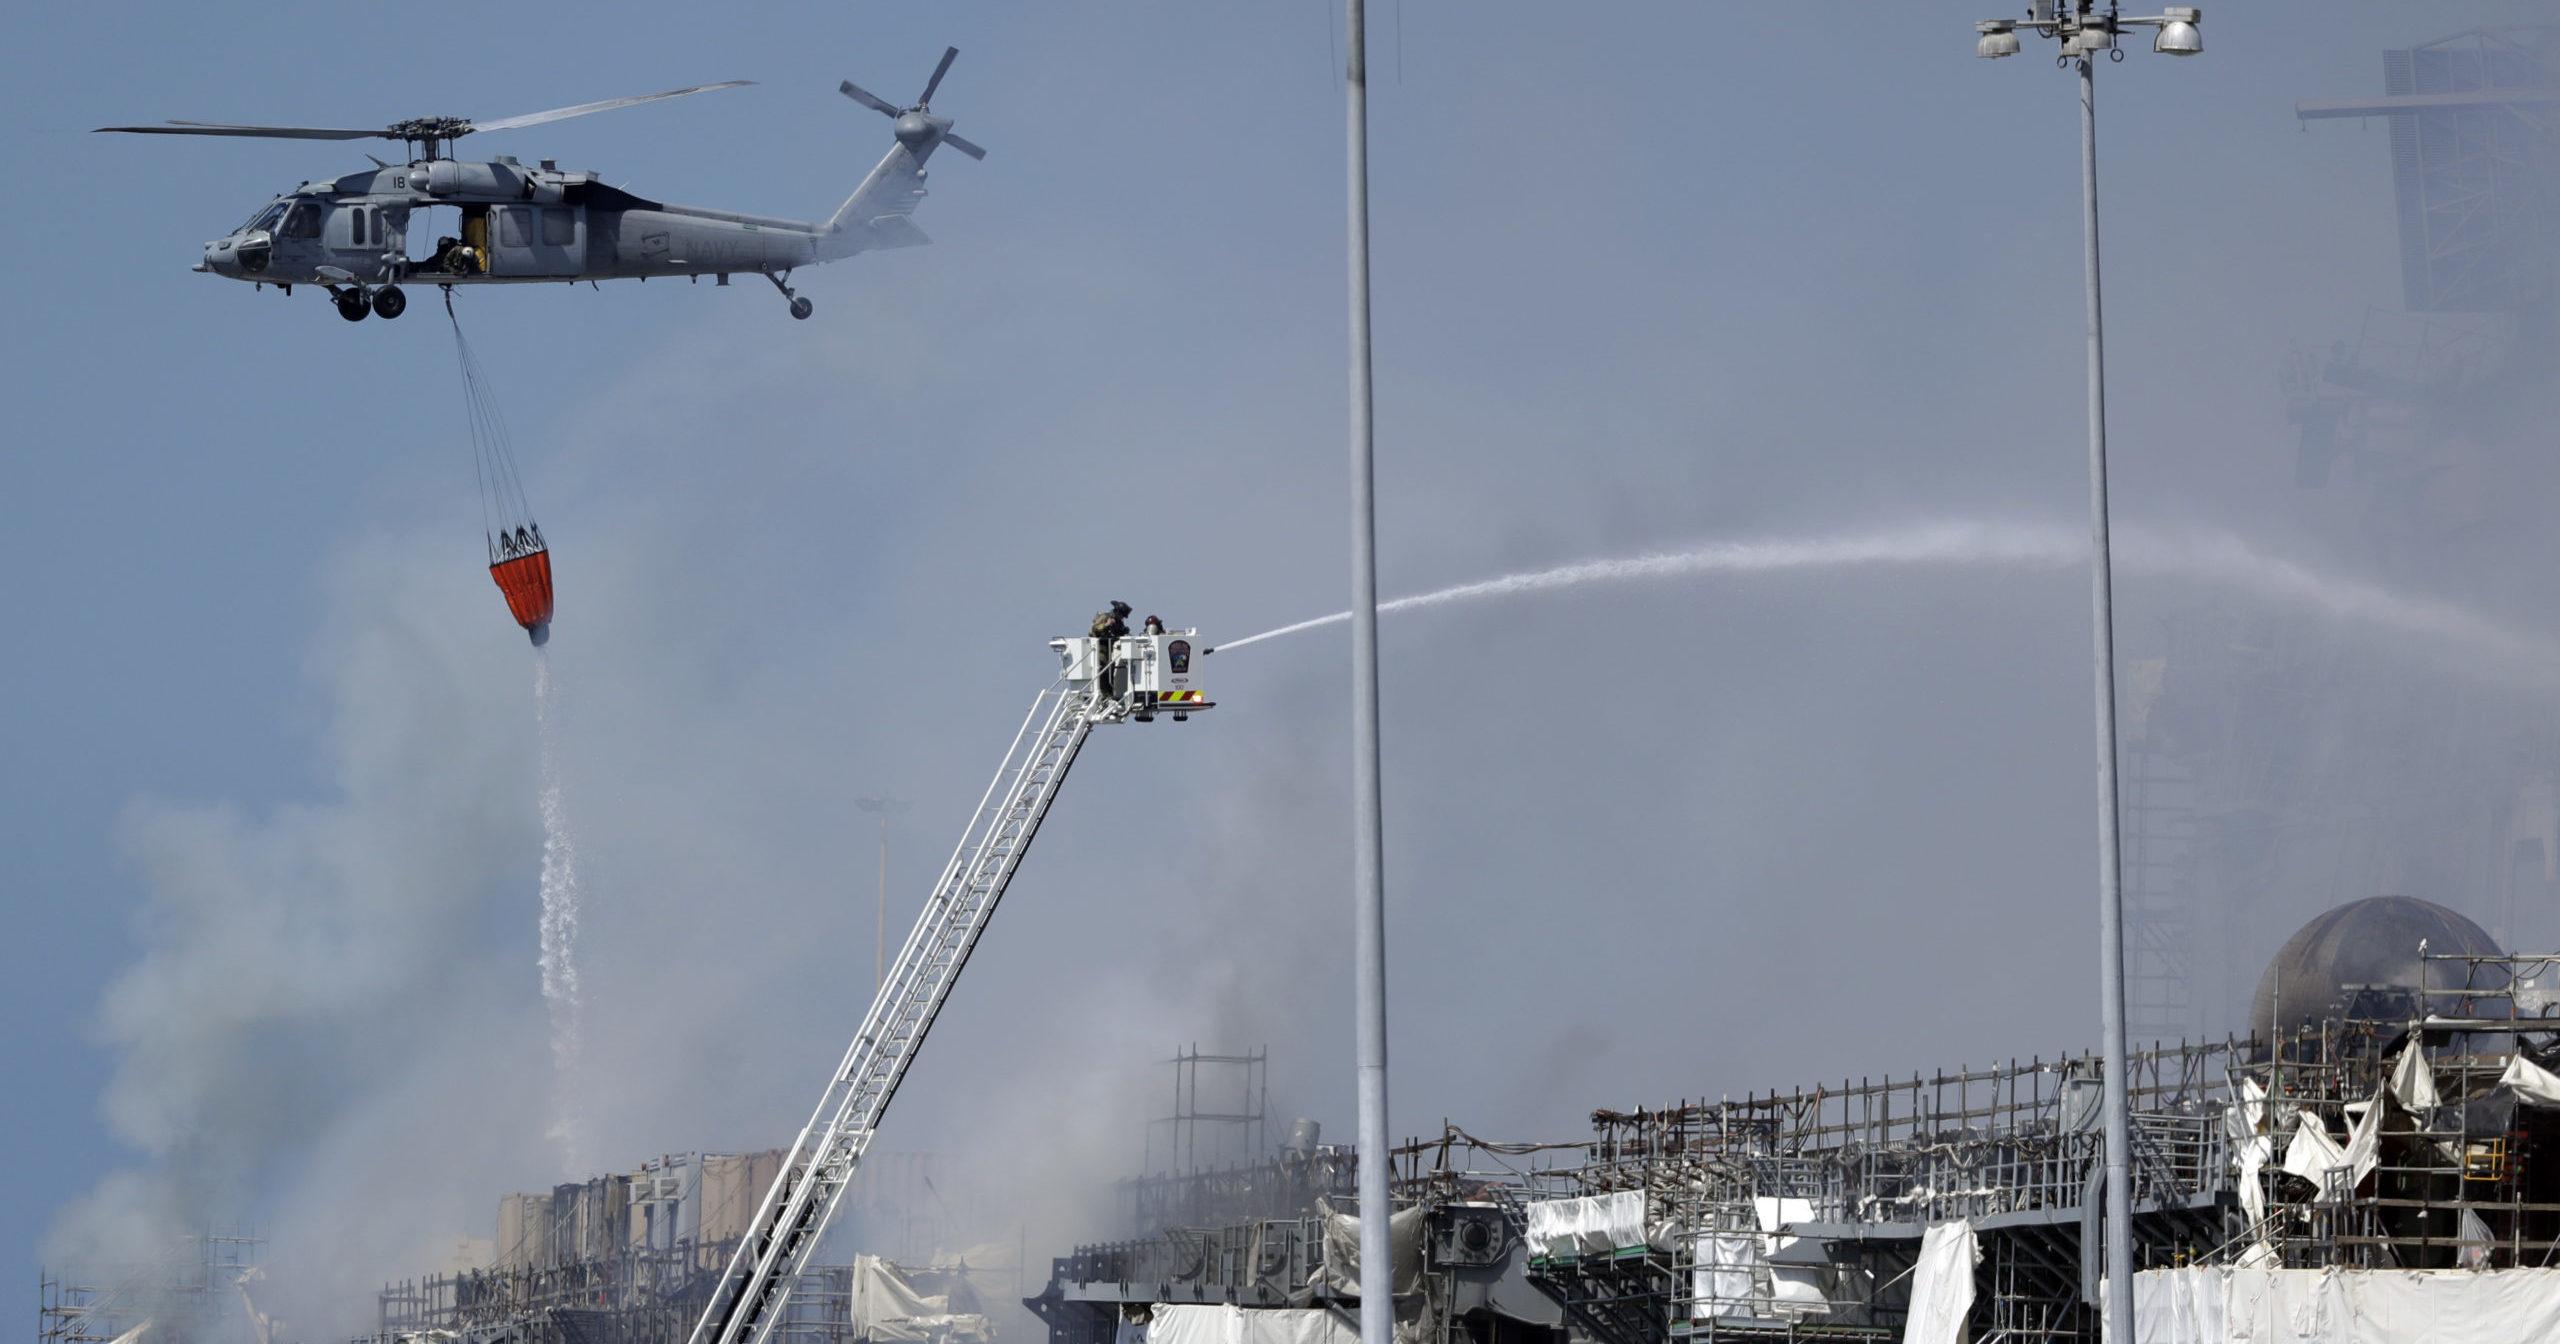 Fire crews battle the fire on the USS Bonhomme Richard on July 13, 2020, in San Diego.